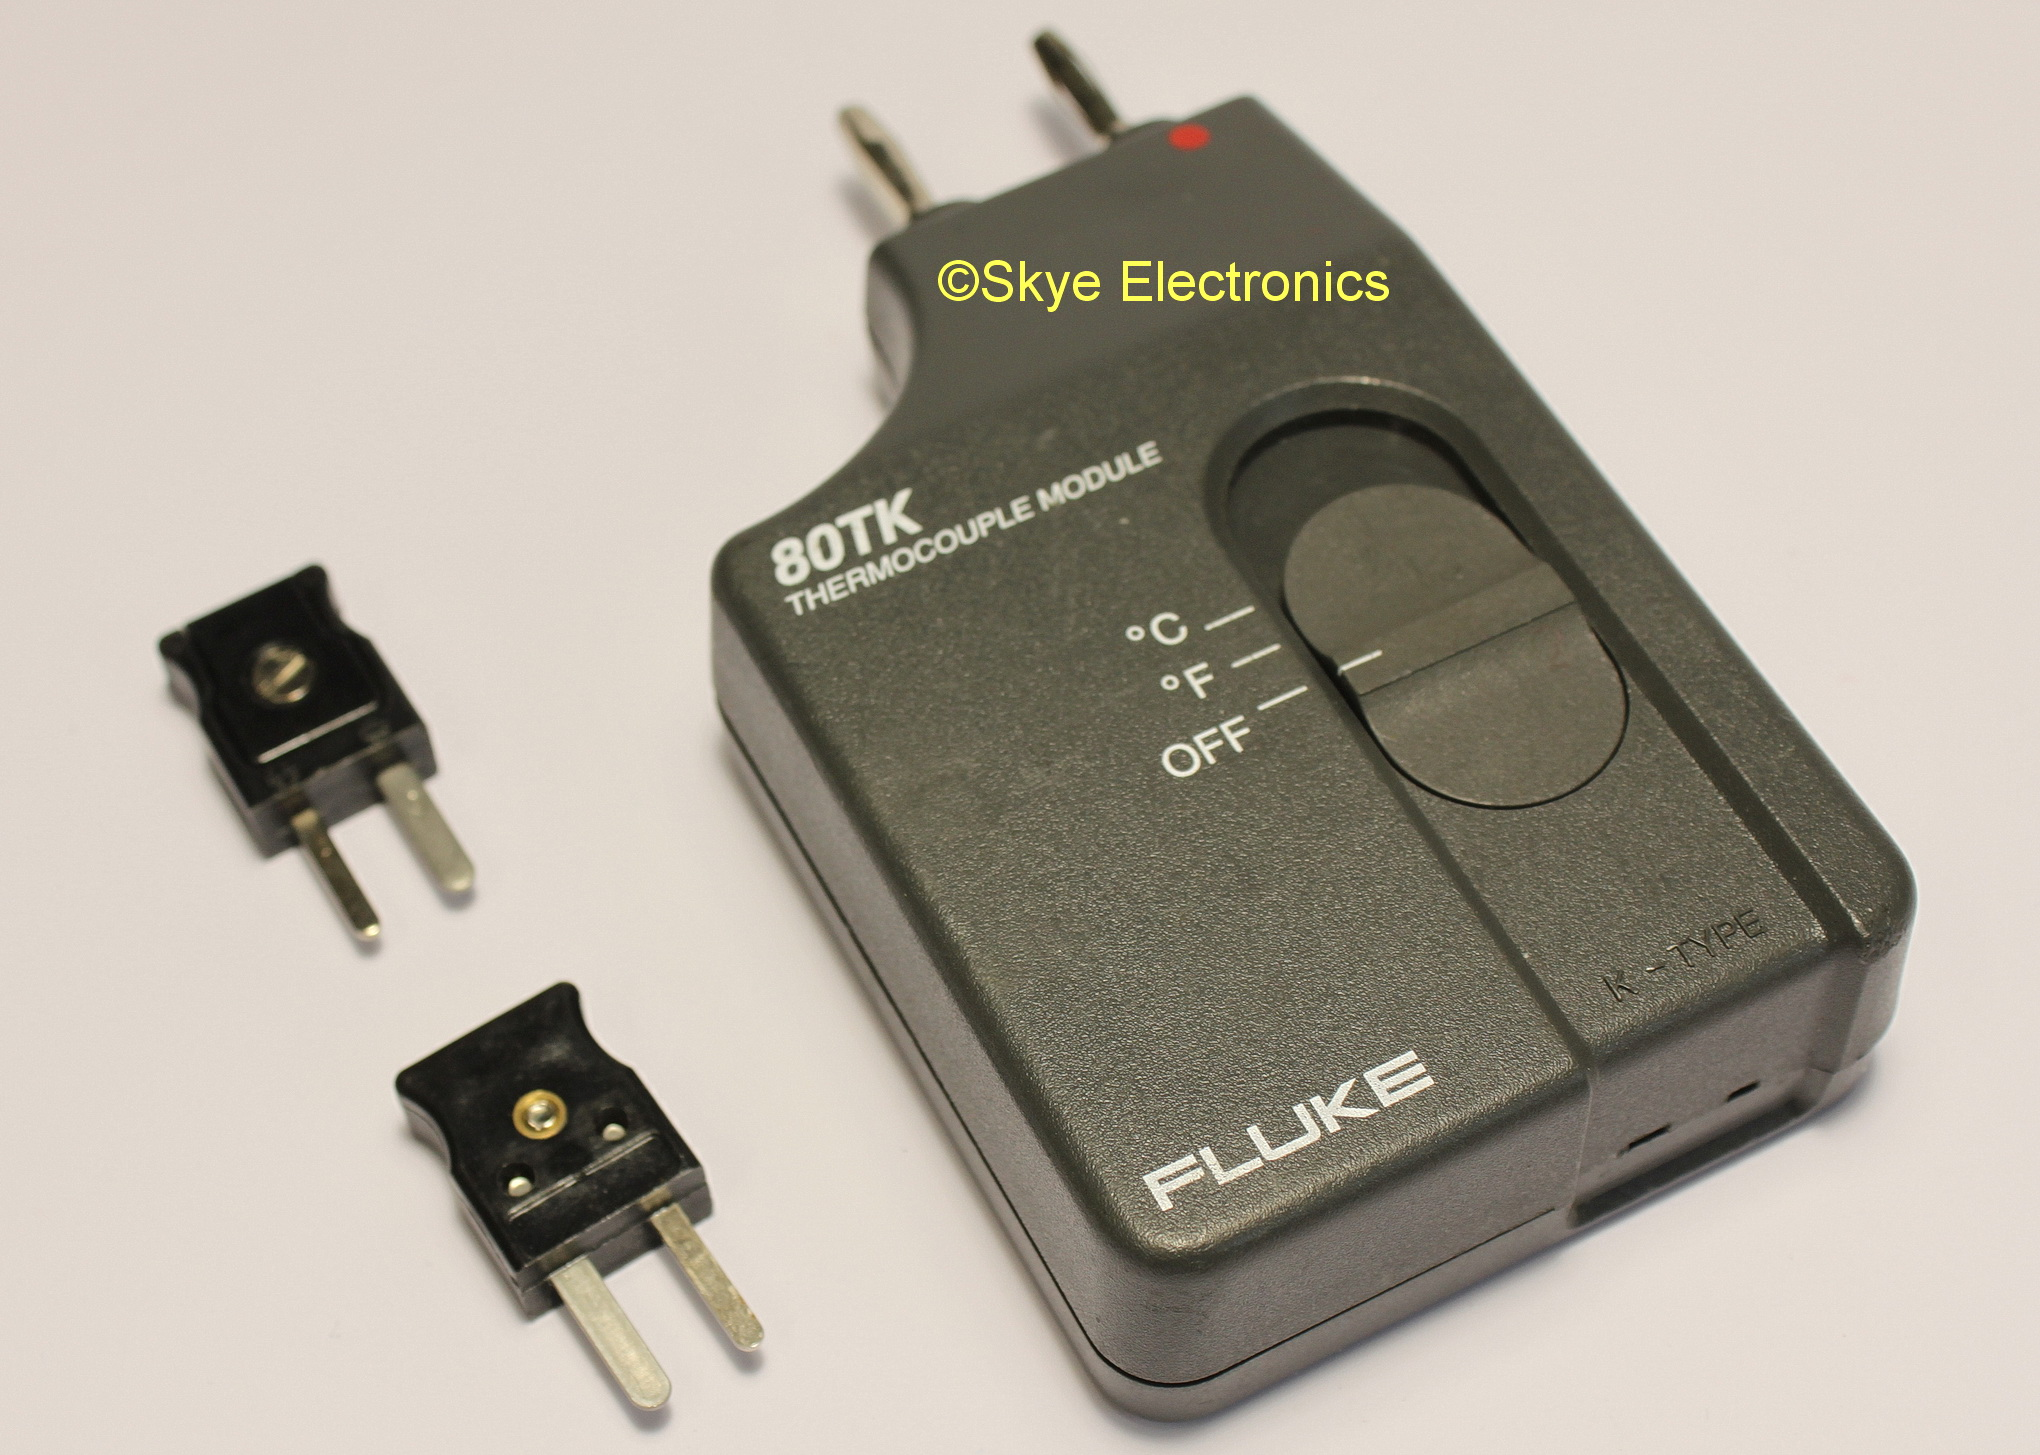 Fluke 80TK Skye Electronics